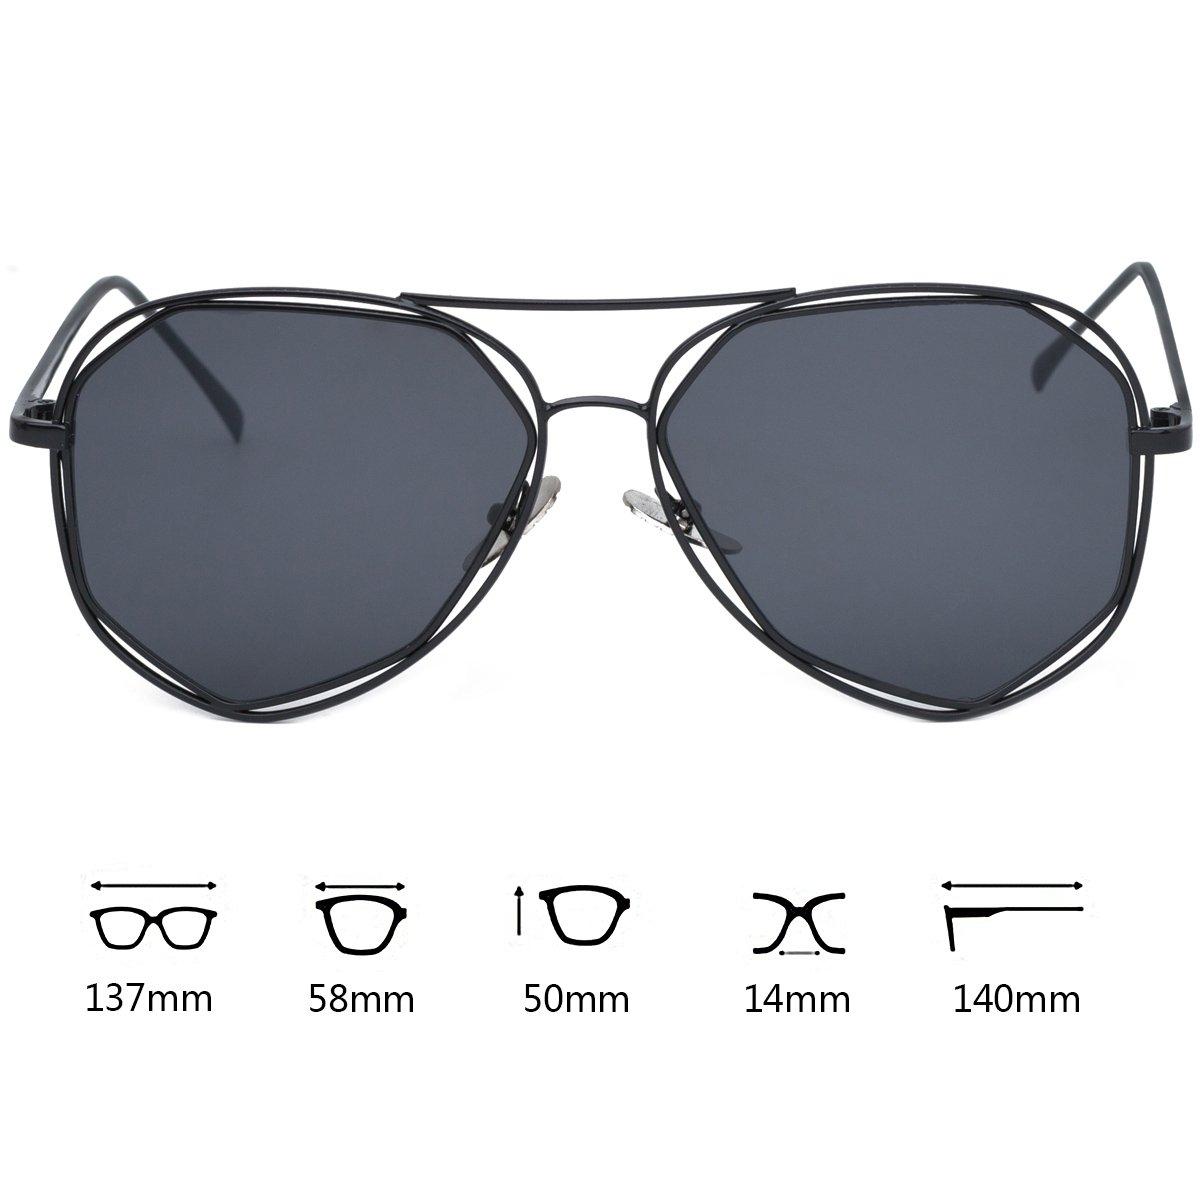 WISH CLUB Oversized Irregular Aviator Sunglasses for Women Men Fashion Stylish Modern Mirrored Glasses